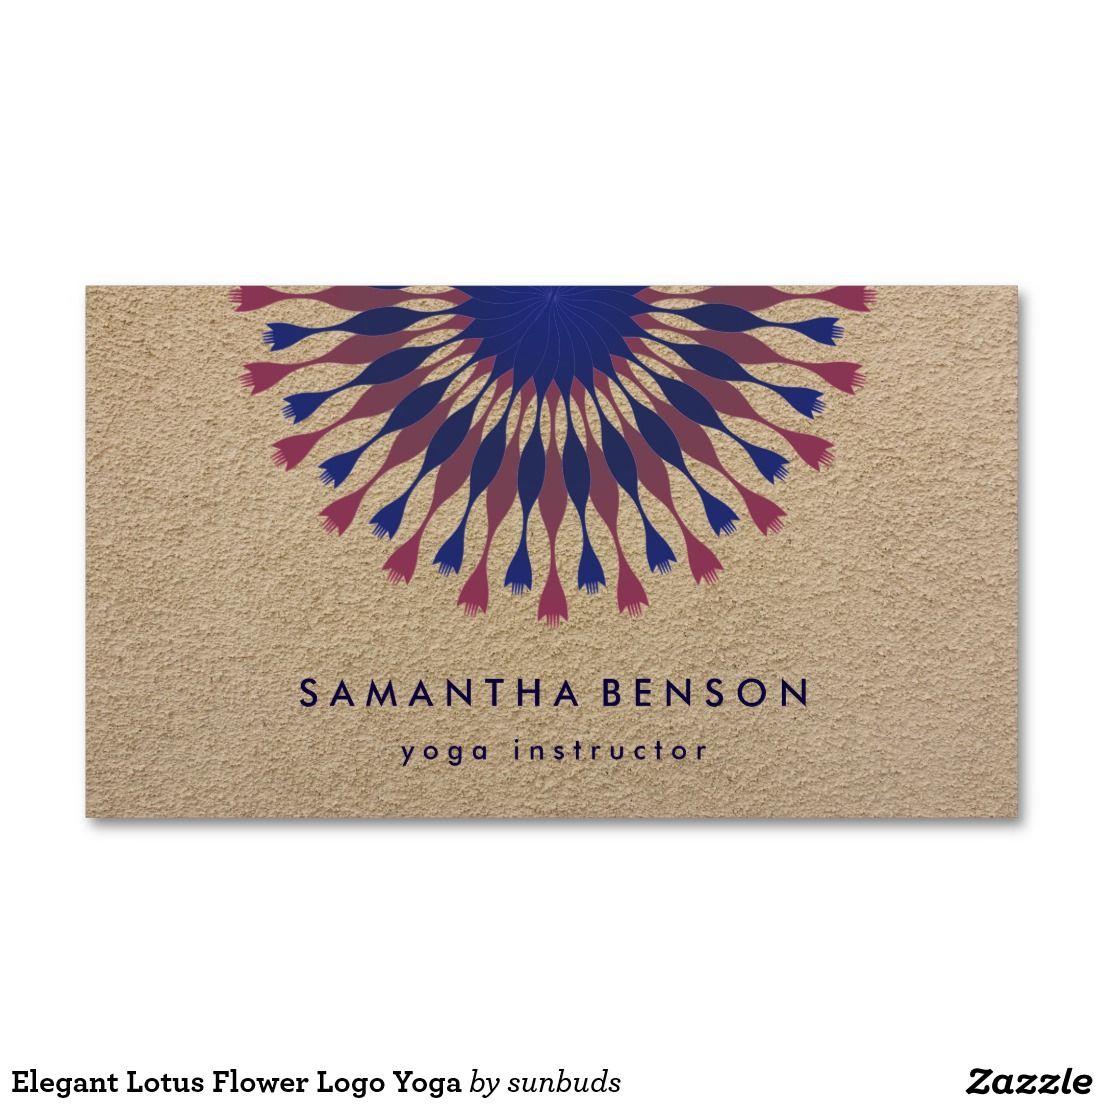 Elegant lotus flower logo yoga business card pinterest flower elegant lotus flower logo yoga business card izmirmasajfo